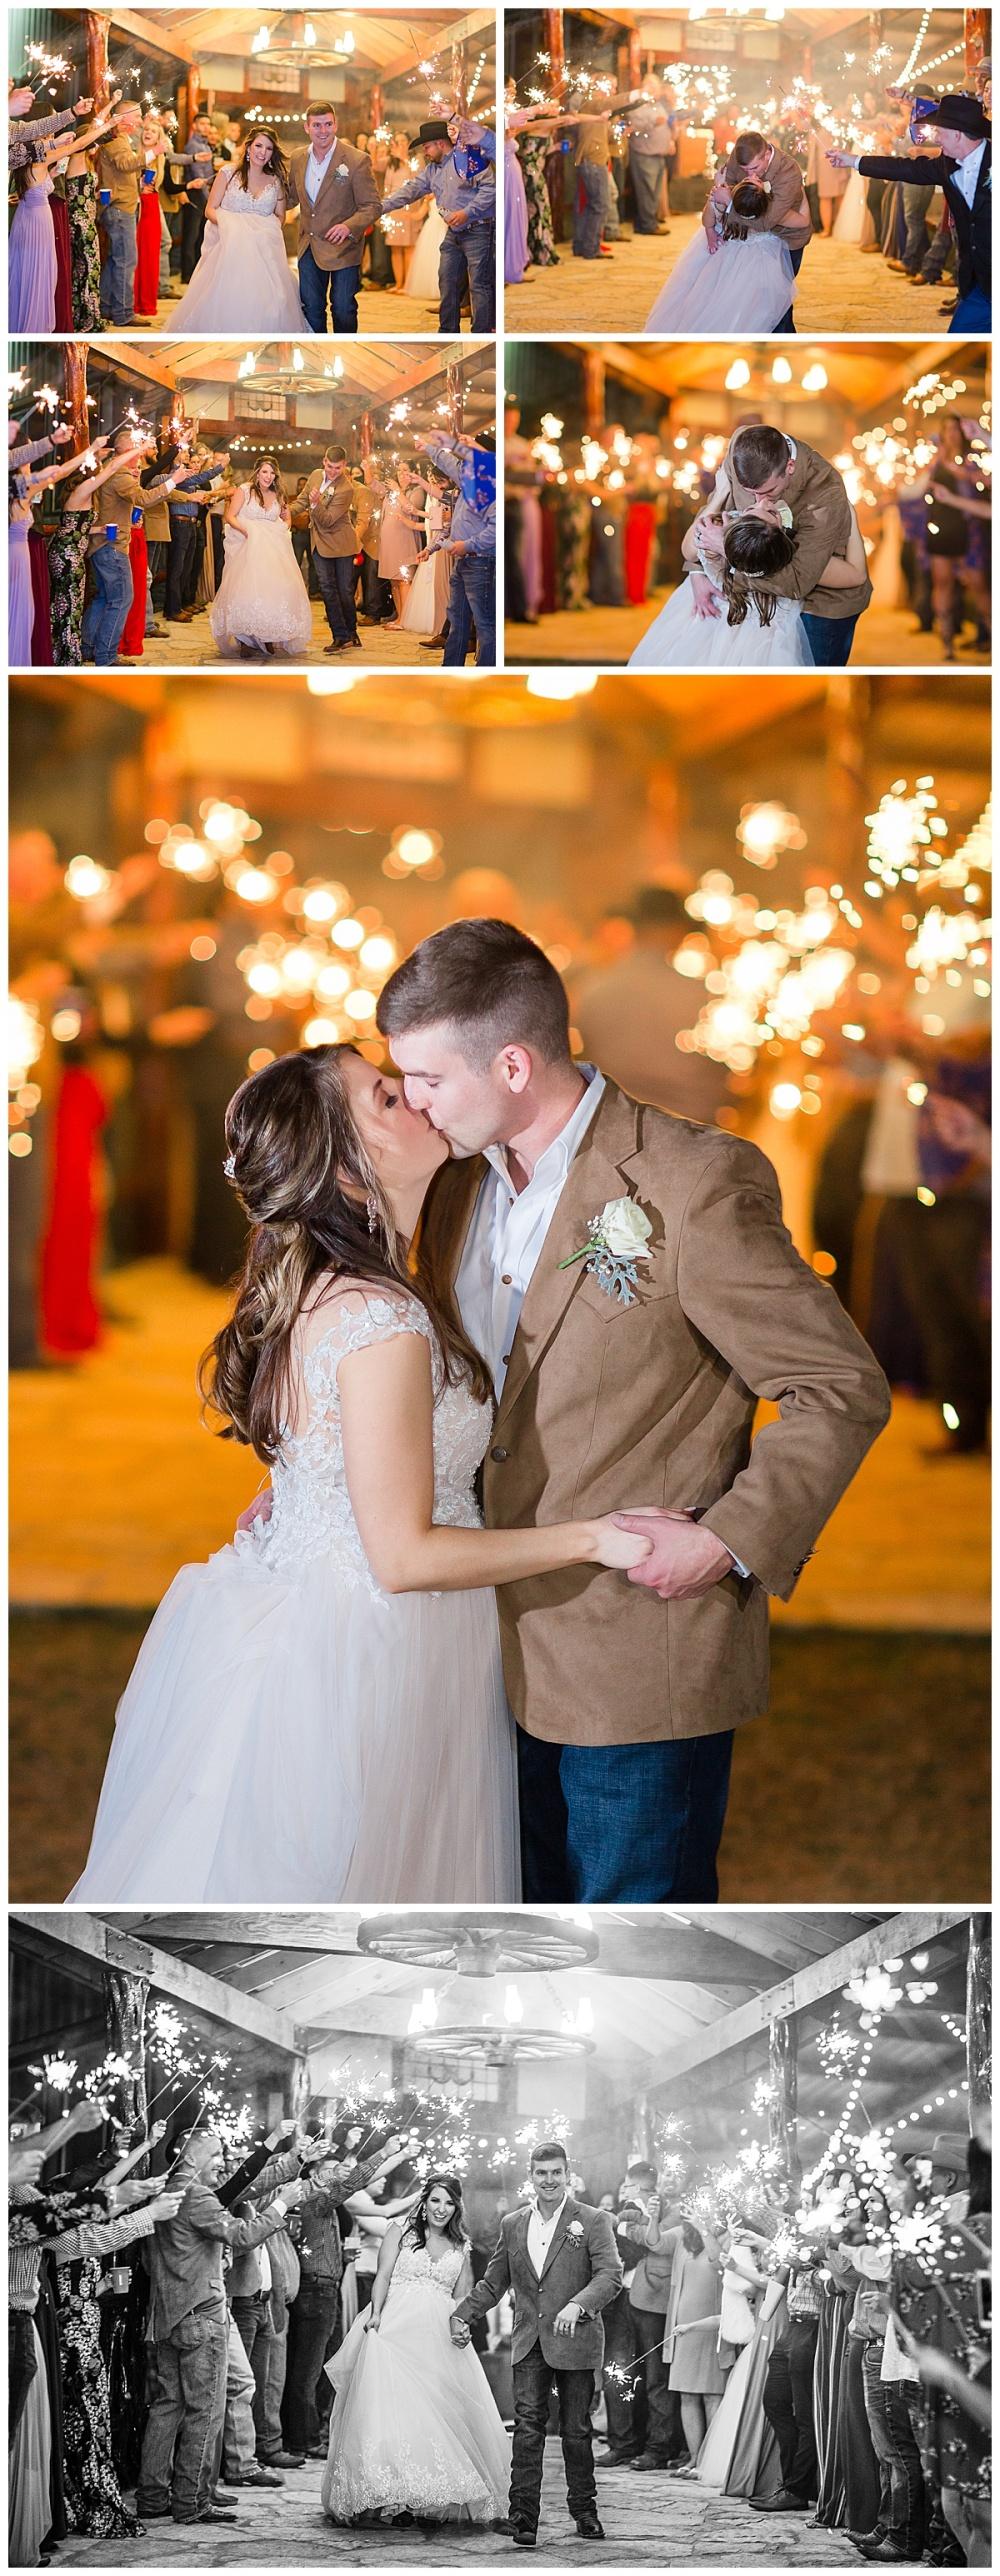 Wedding-Photographer-Texas-Hill-Country-Happy-H-Ranch-Comfor-Texas-Carly-Barton-Photography_0056.jpg